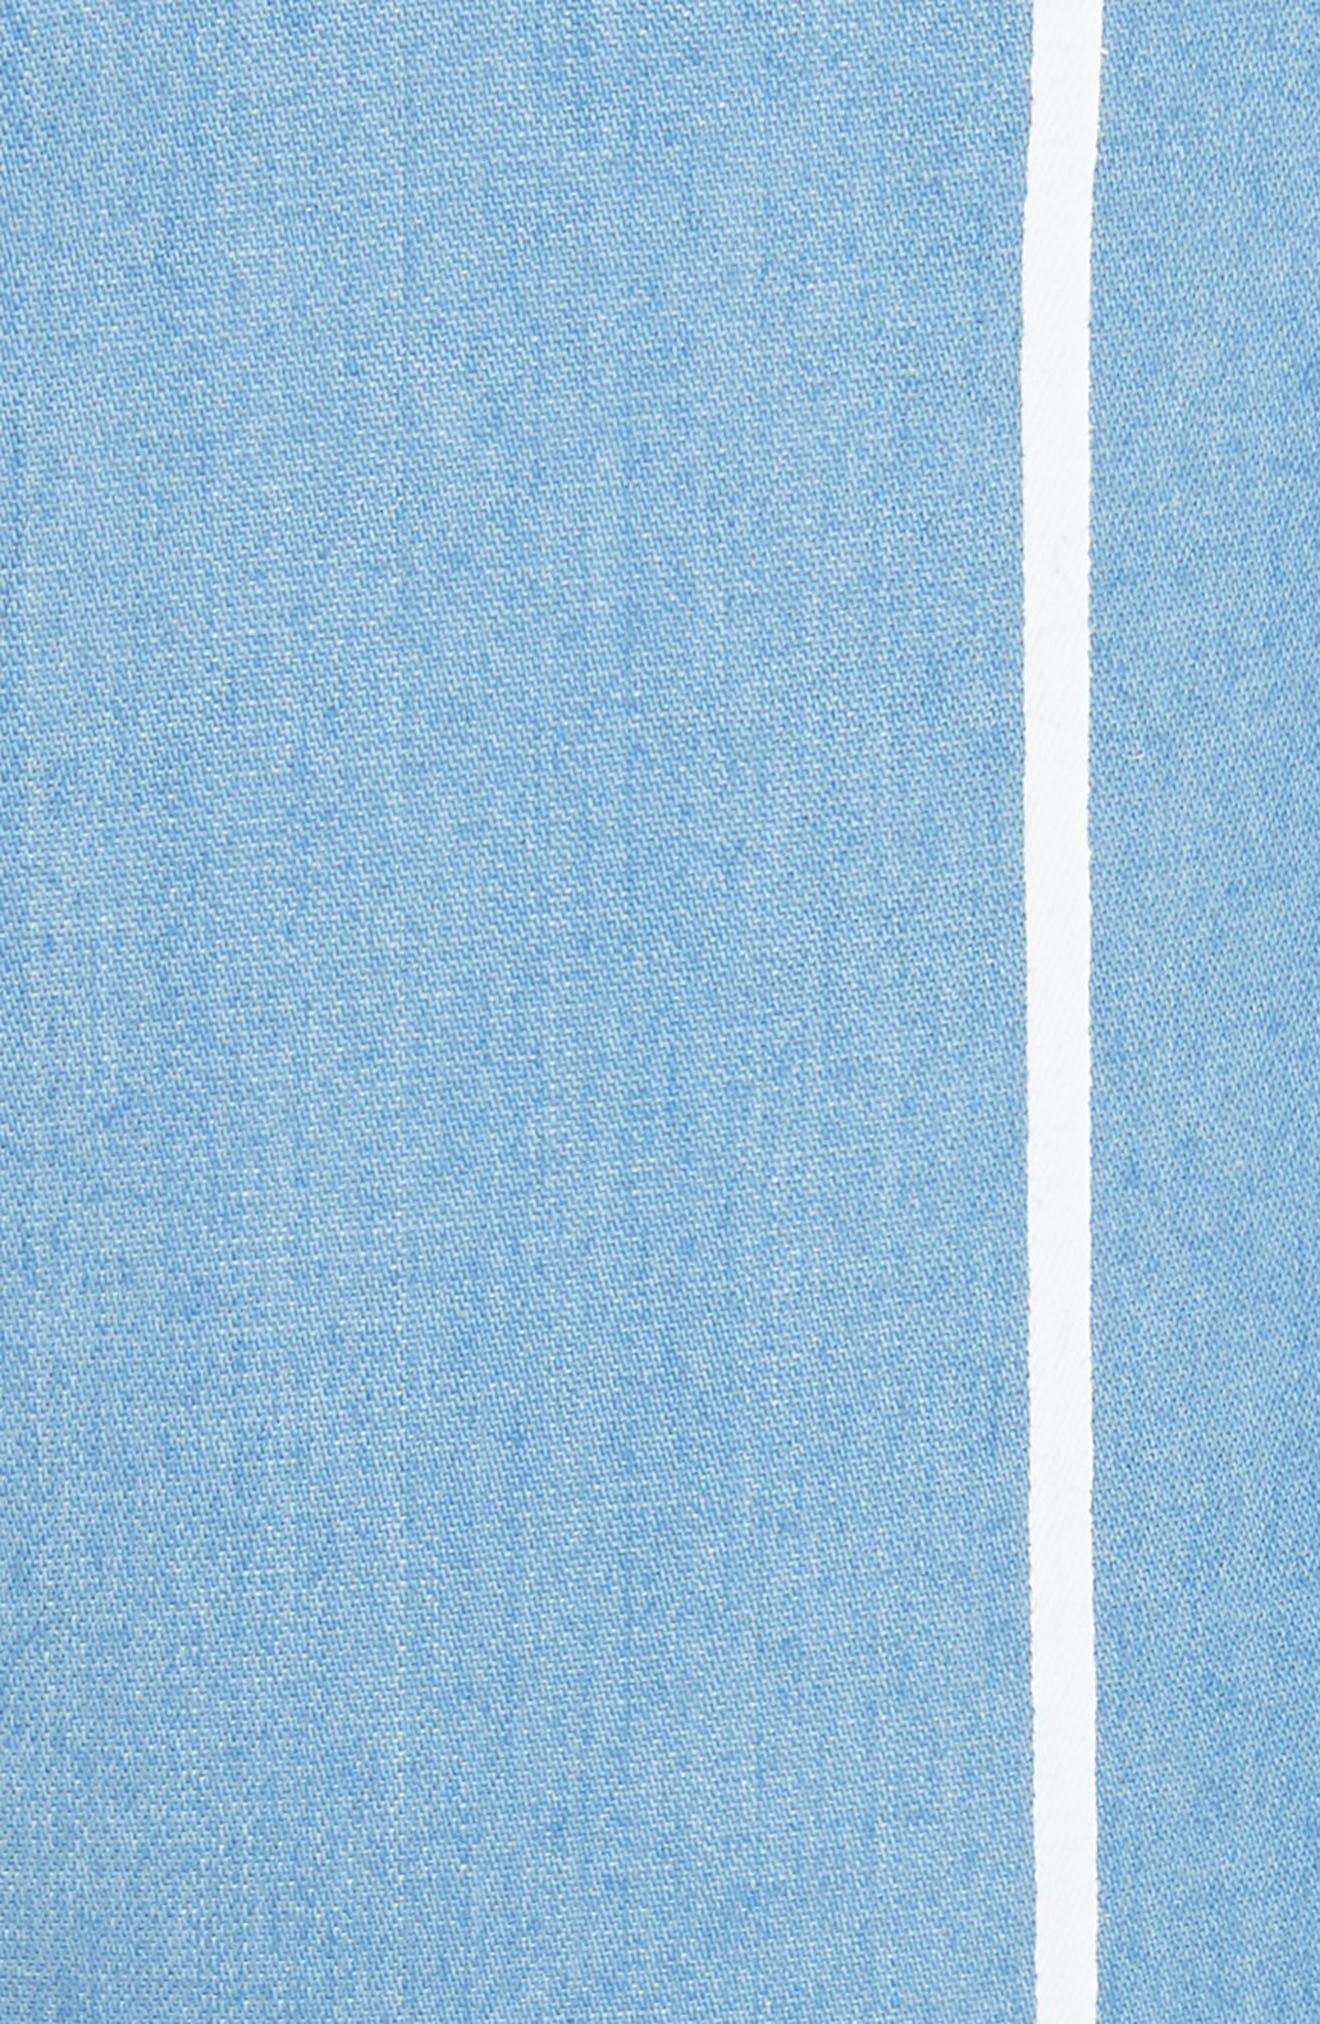 Stripe Slim Shorts,                             Alternate thumbnail 5, color,                             White Stripe